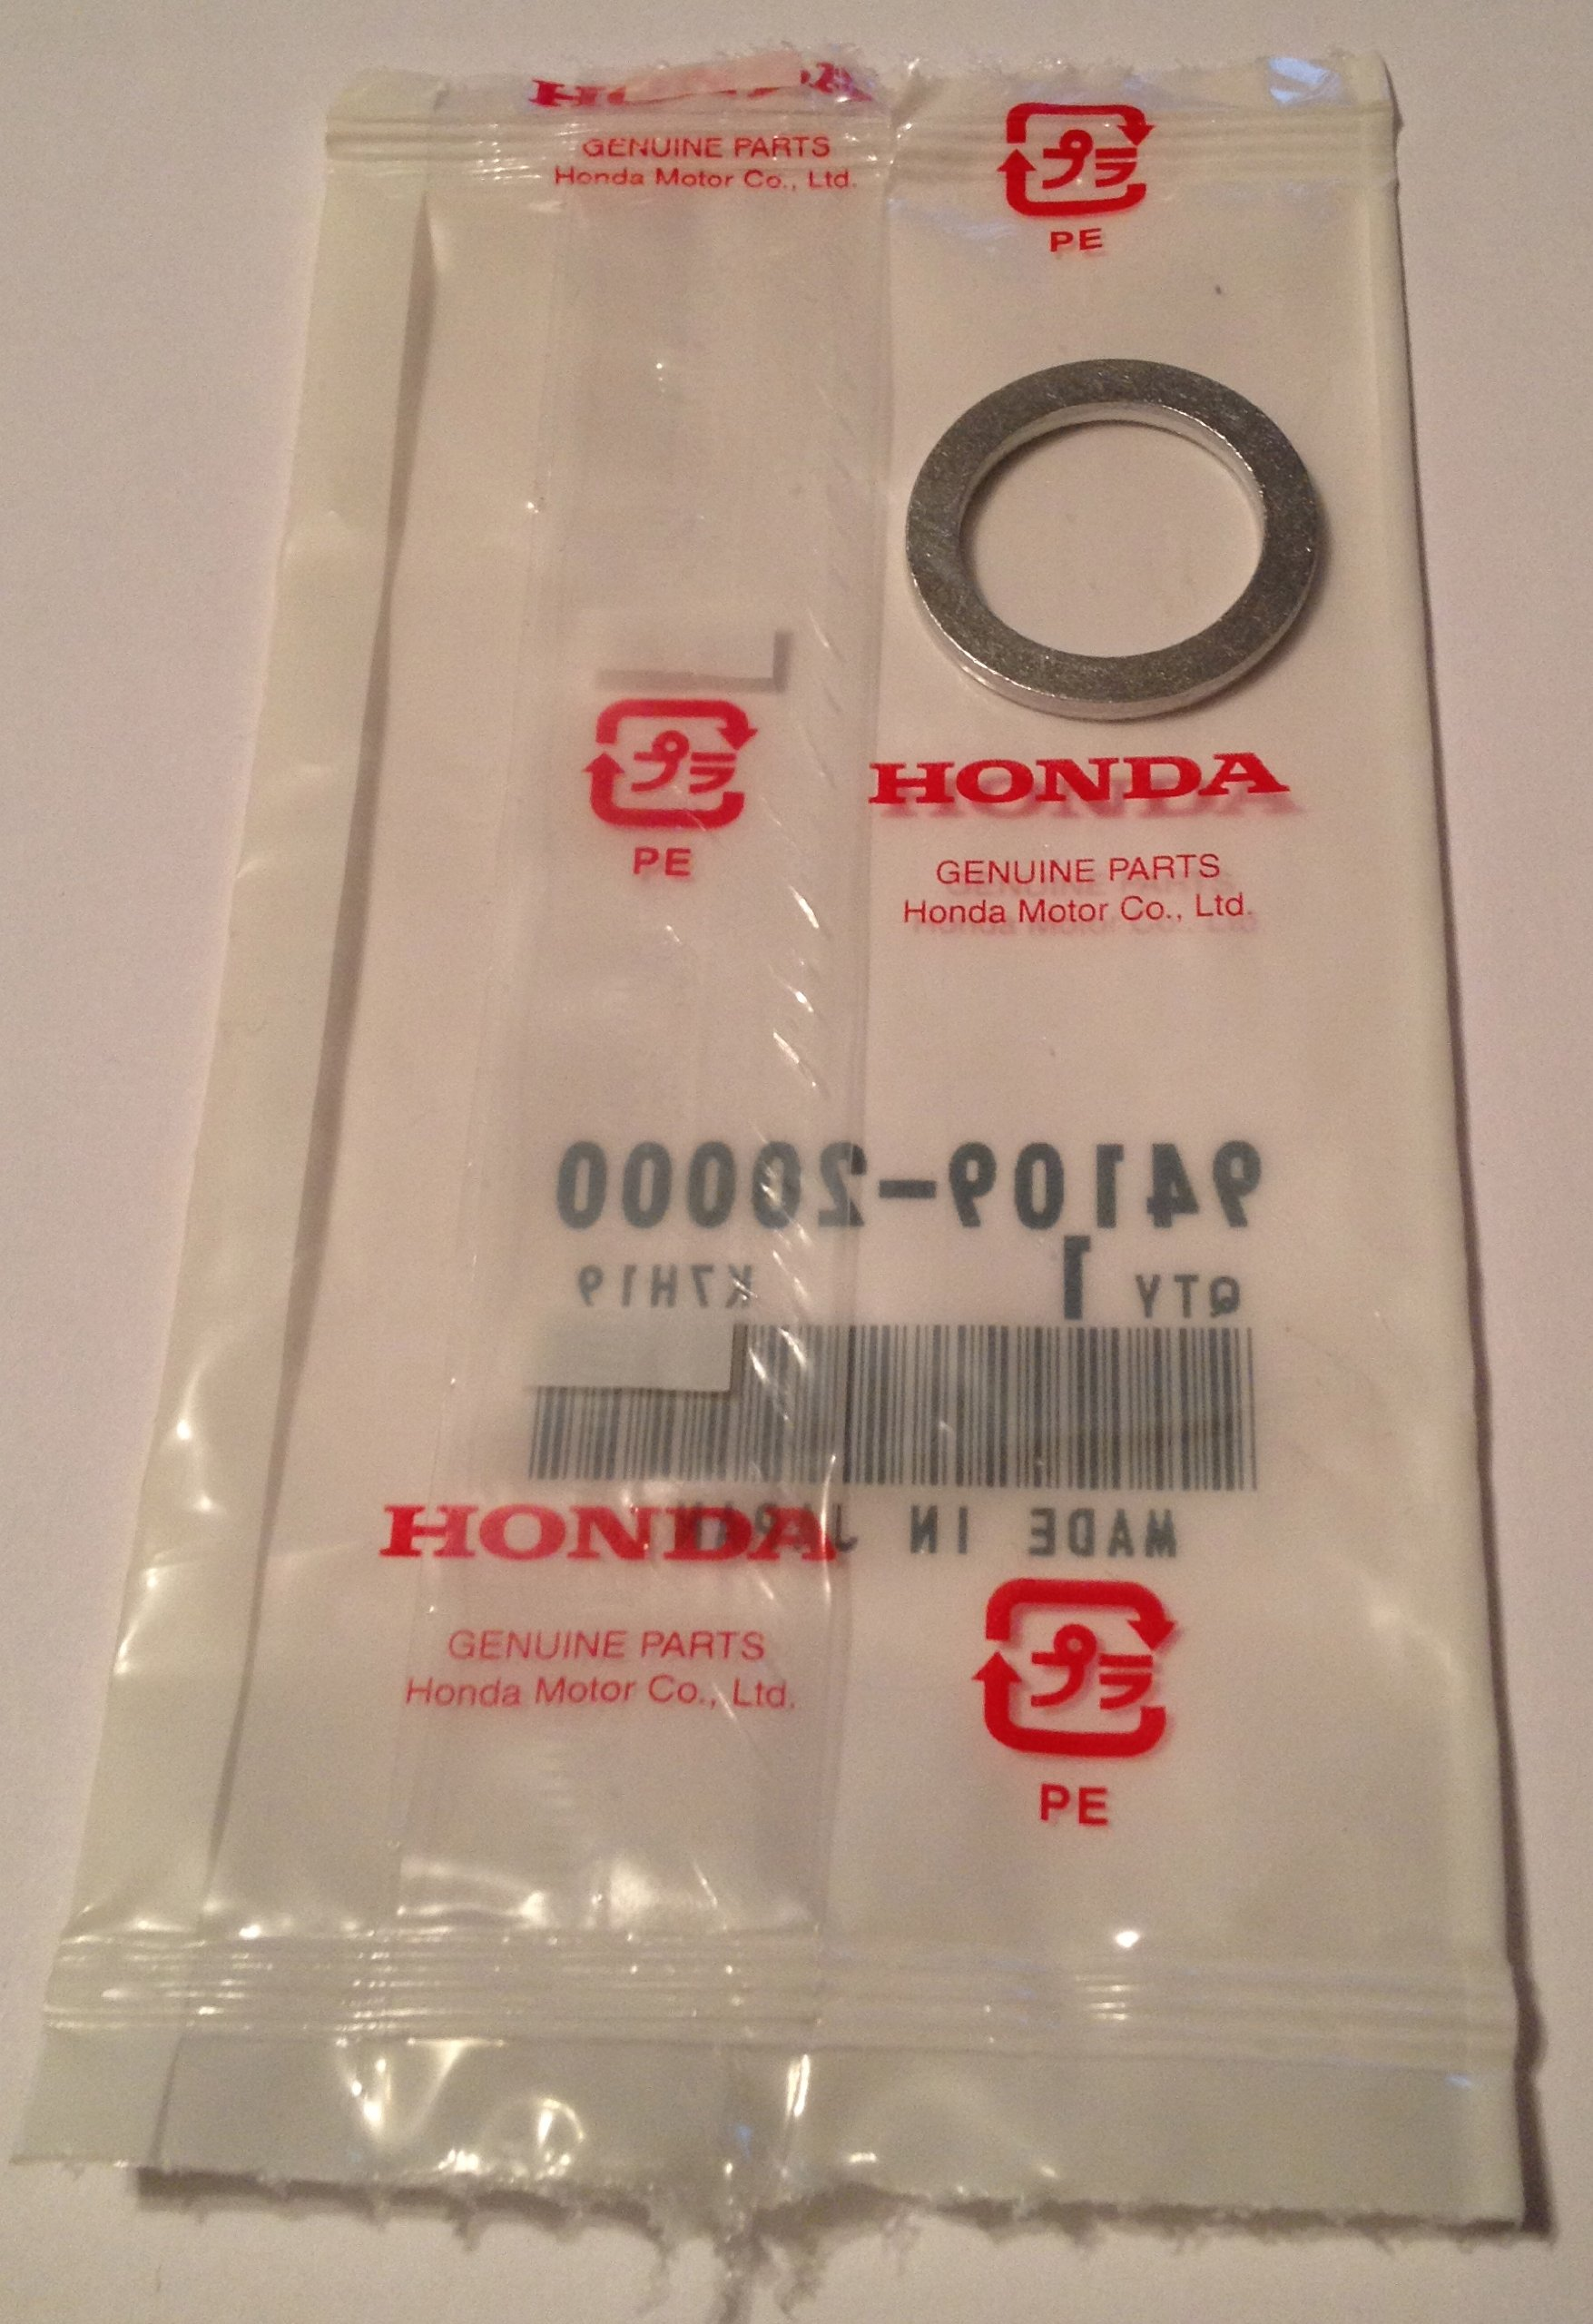 Honda Genuine OEM Rear Differential Drain / Fill Plug Washer - 94109-20000 - 20mm